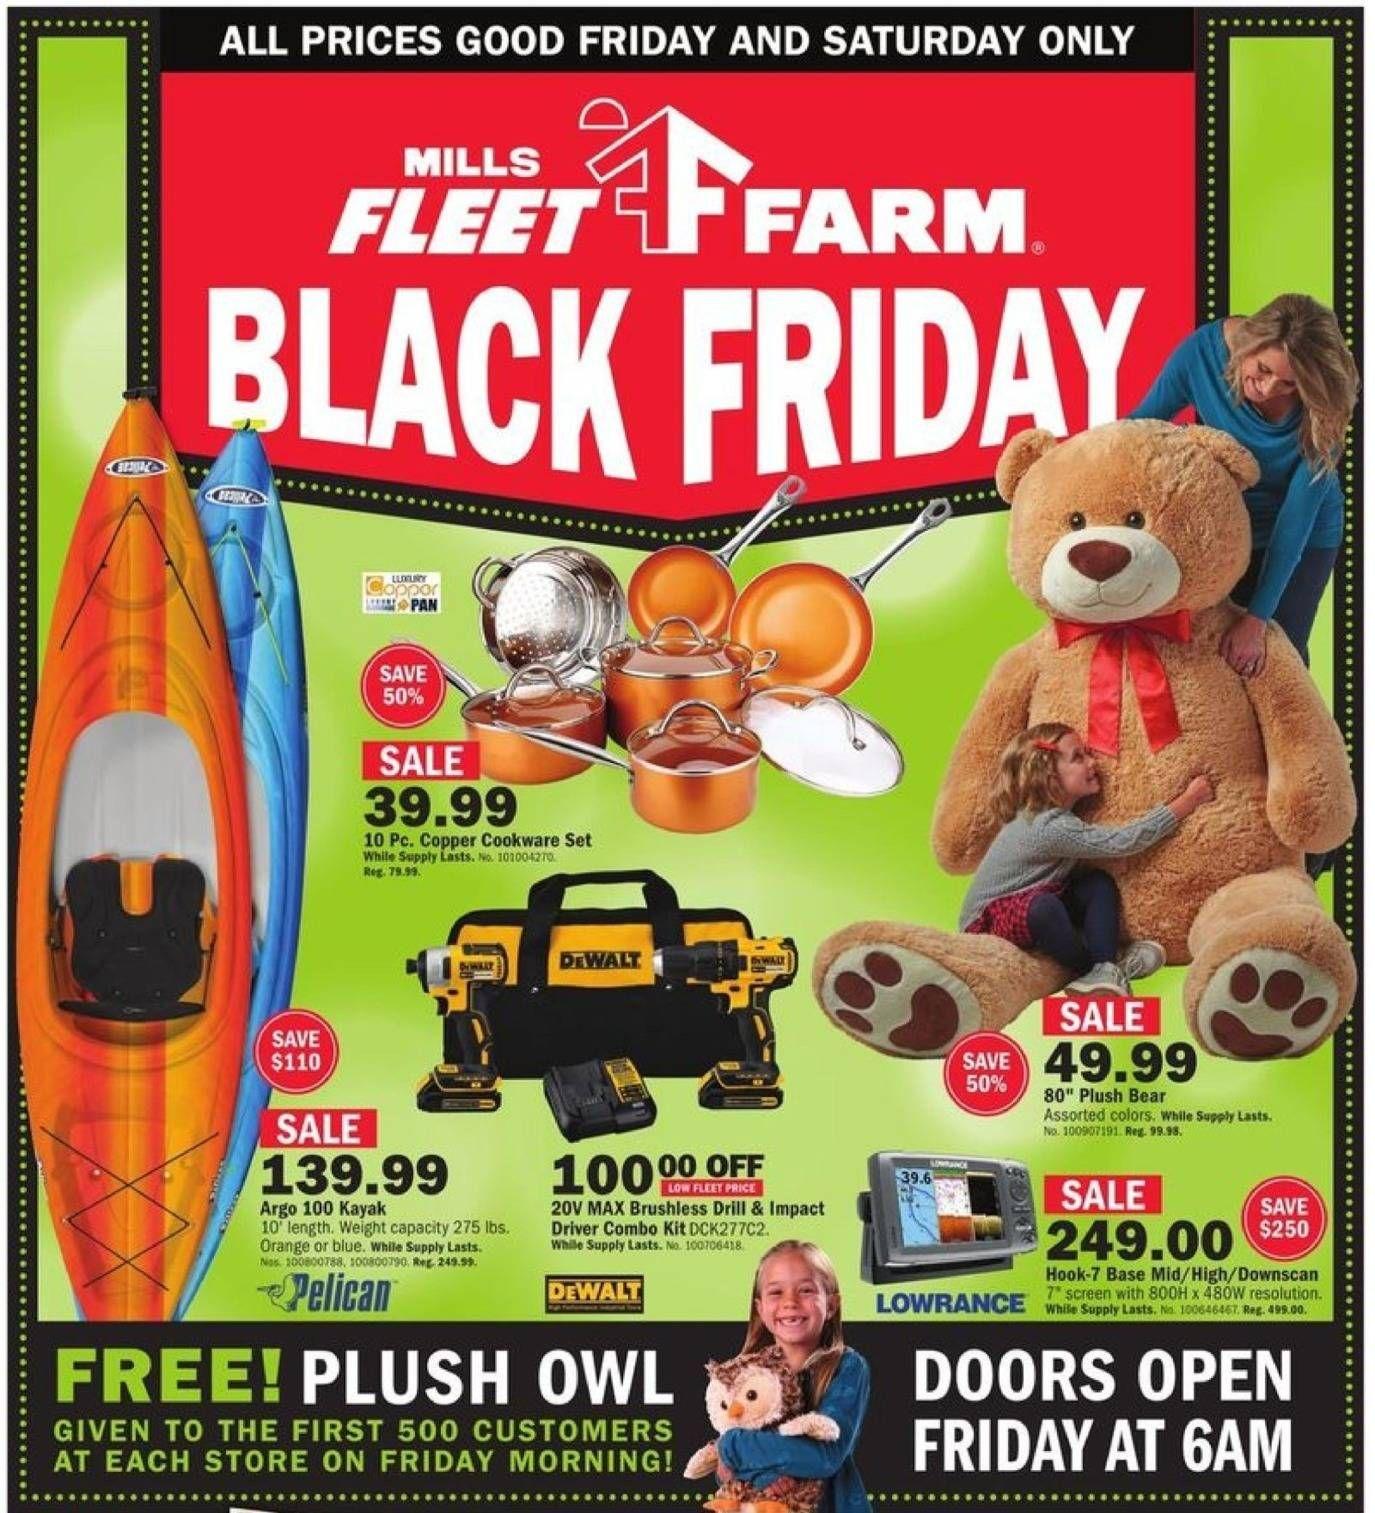 Fleet Farm 2019 Black Friday Ad Fleet Farm Mills Fleet Farm Black Friday